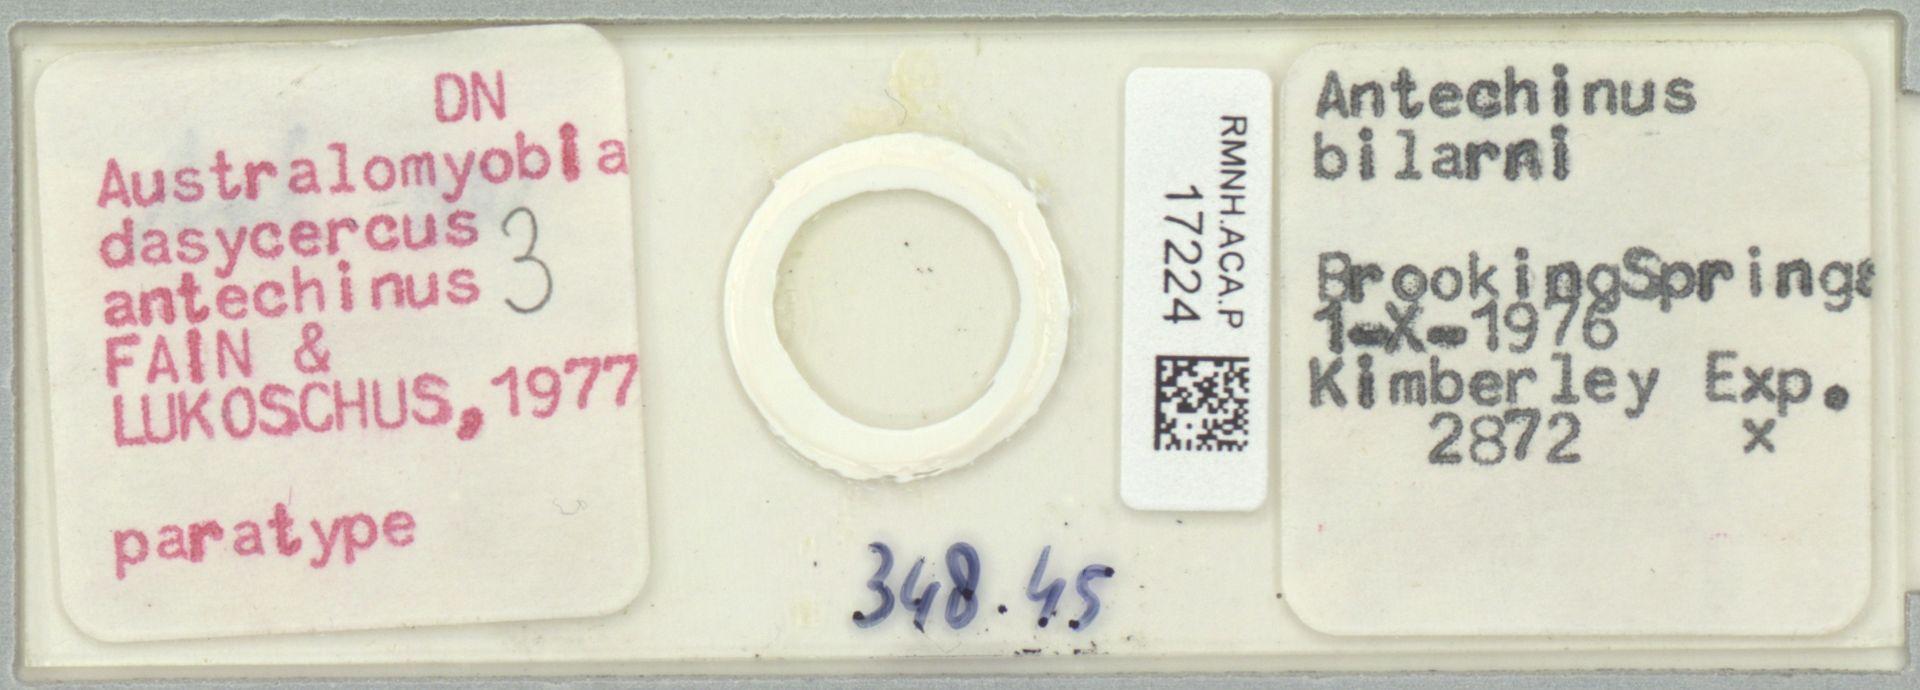 RMNH.ACA.P.17224 | Australomyobia dasycercus antechinus